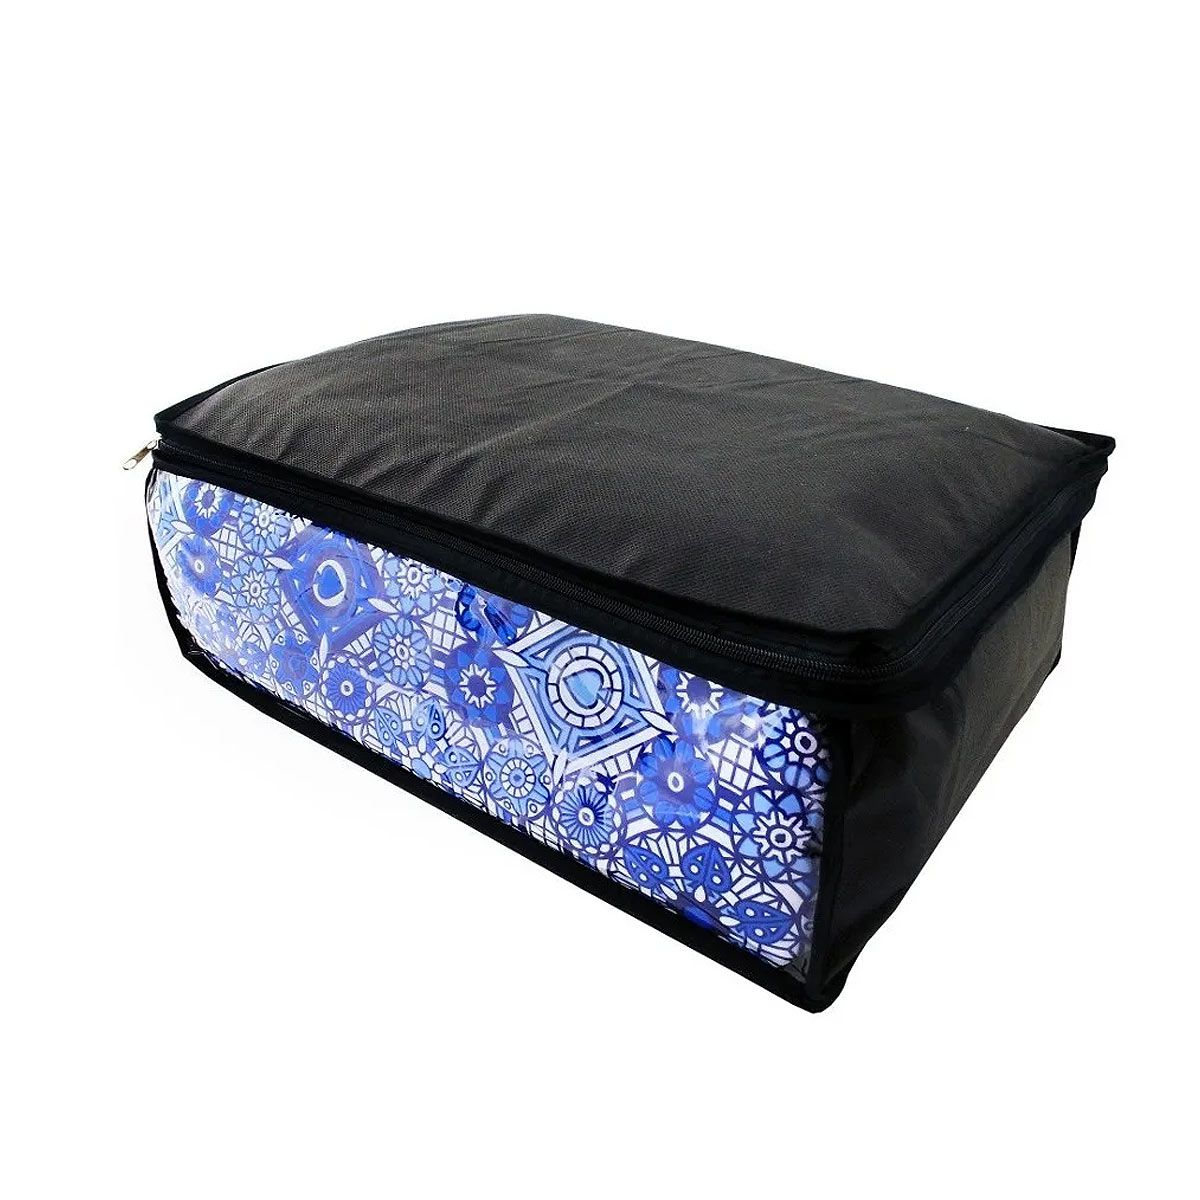 Capa Porta Edredom Cobertor Toalha Roupas - Kit Com 3 P M G